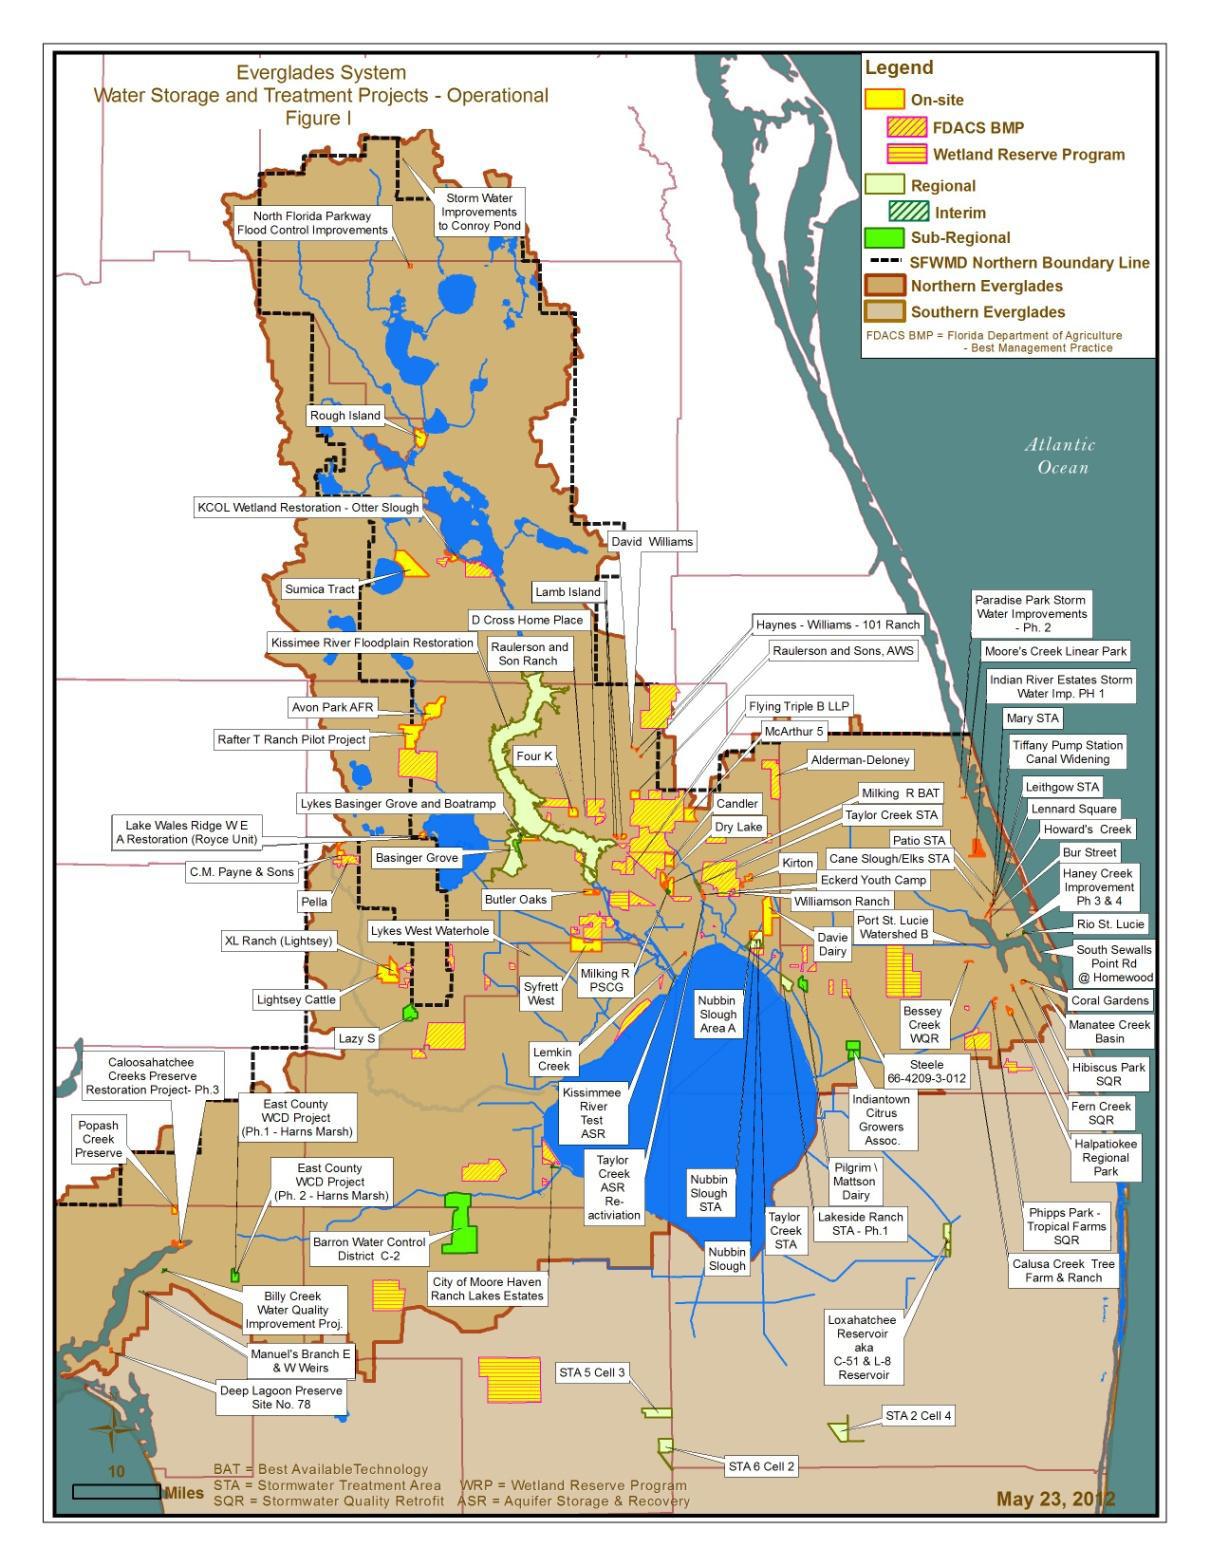 South Florida Water Management District Map South Florida Water Management District Dispersed Water Management